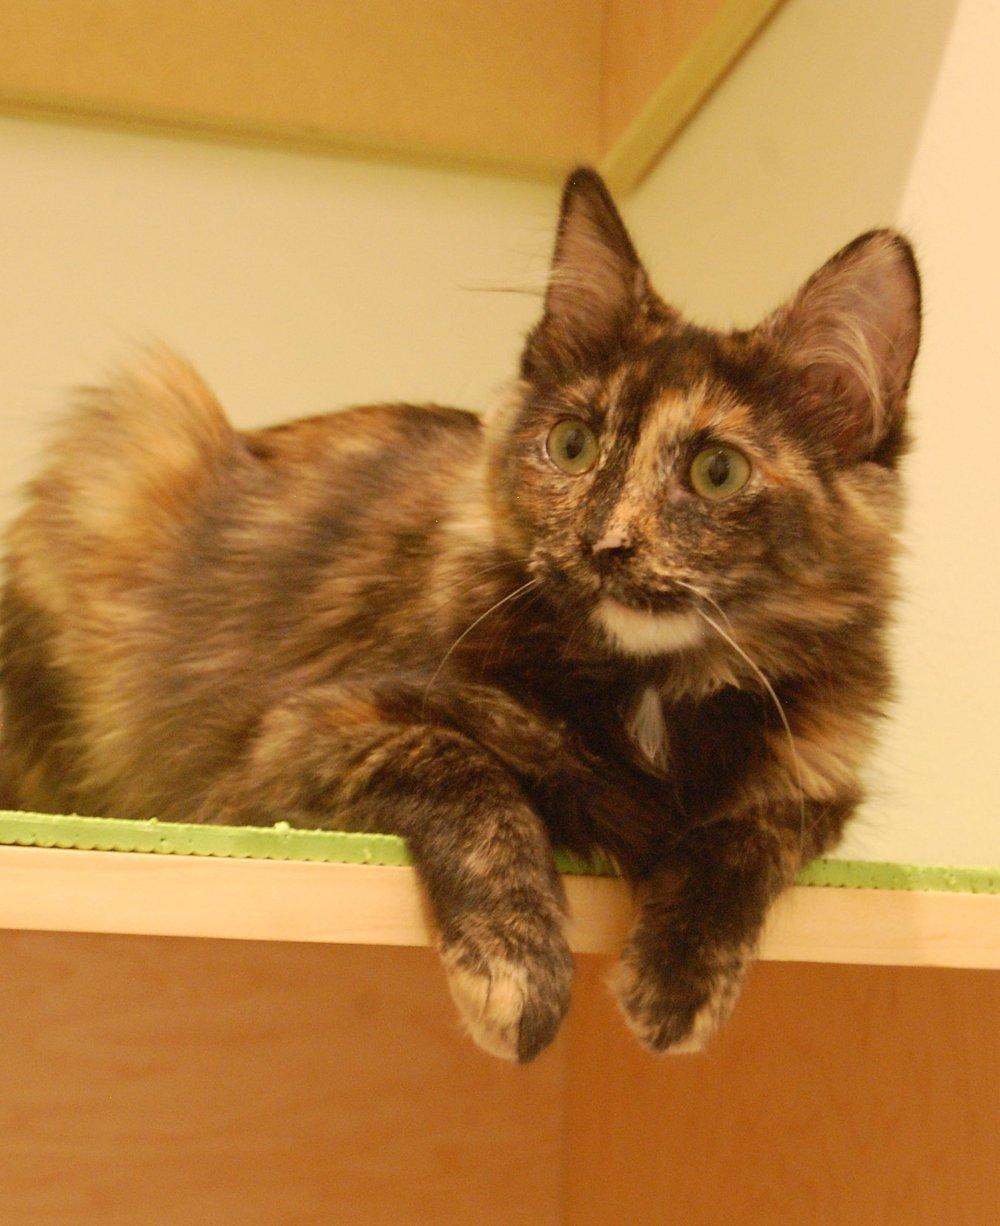 TULSA Adopted 9/17